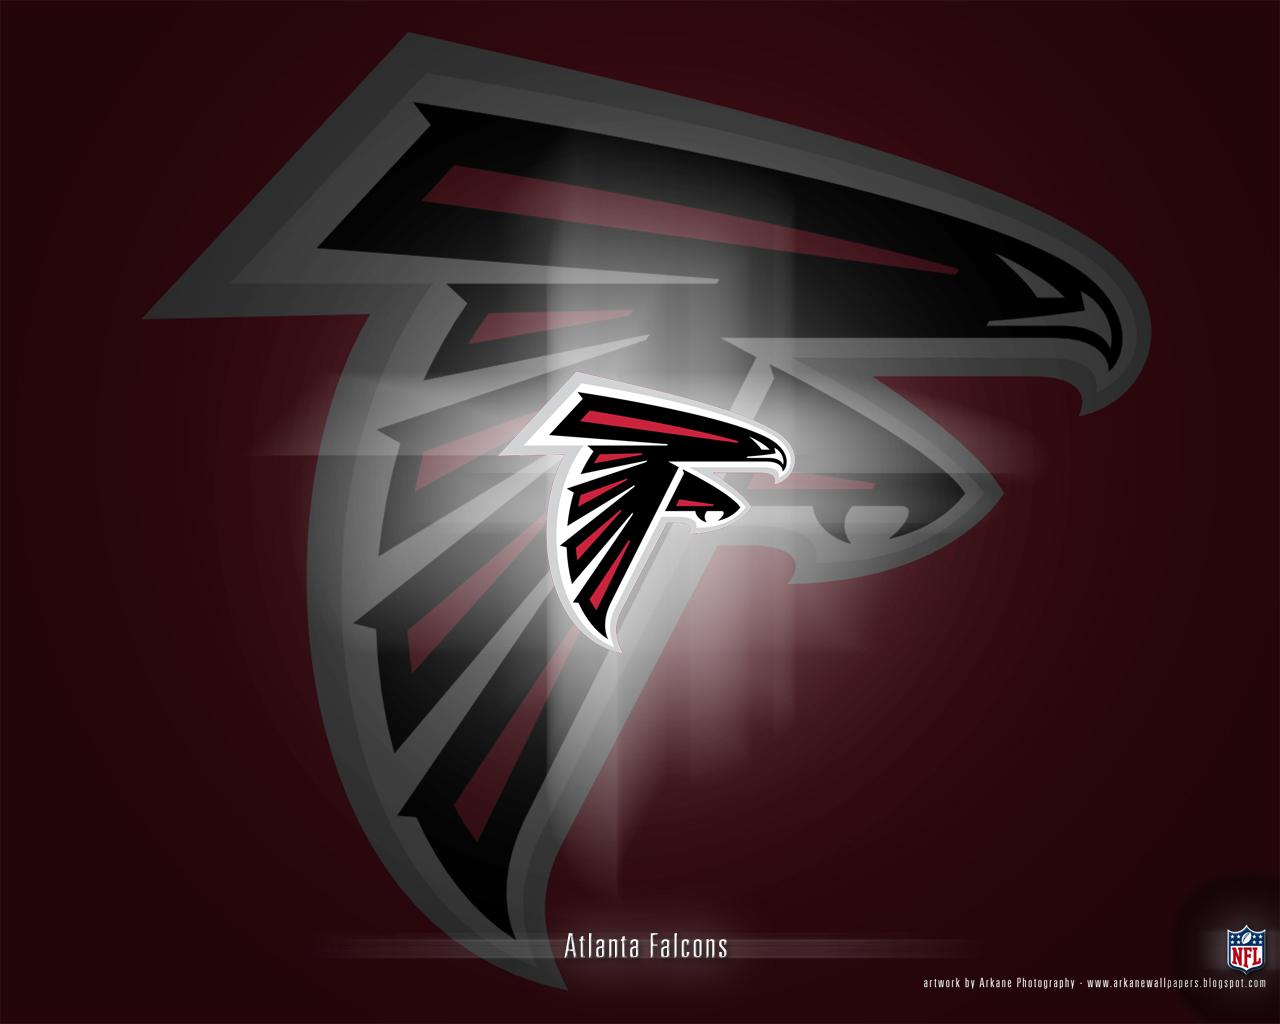 San Francisco 49ers Wallpaper Iphone Atlanta Falcons Images Atlanta Falcons Hd Wallpaper And